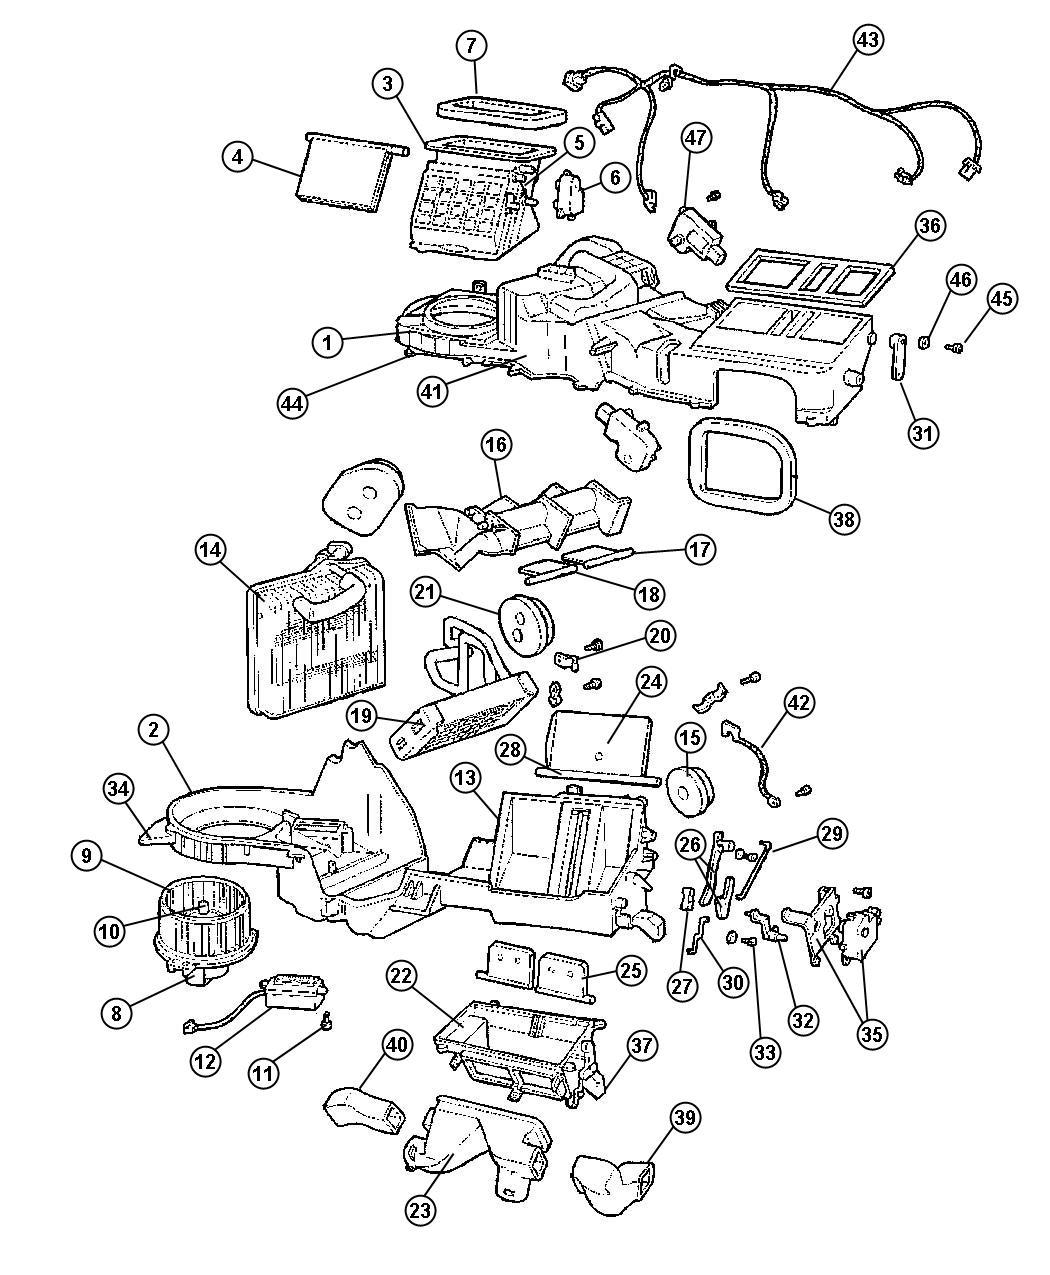 hight resolution of engine diagram chrysler sebring touring v6 2 7l get free 2002 chrysler sebring engine ground wire diagram 1999 chrysler sebring engine diagram